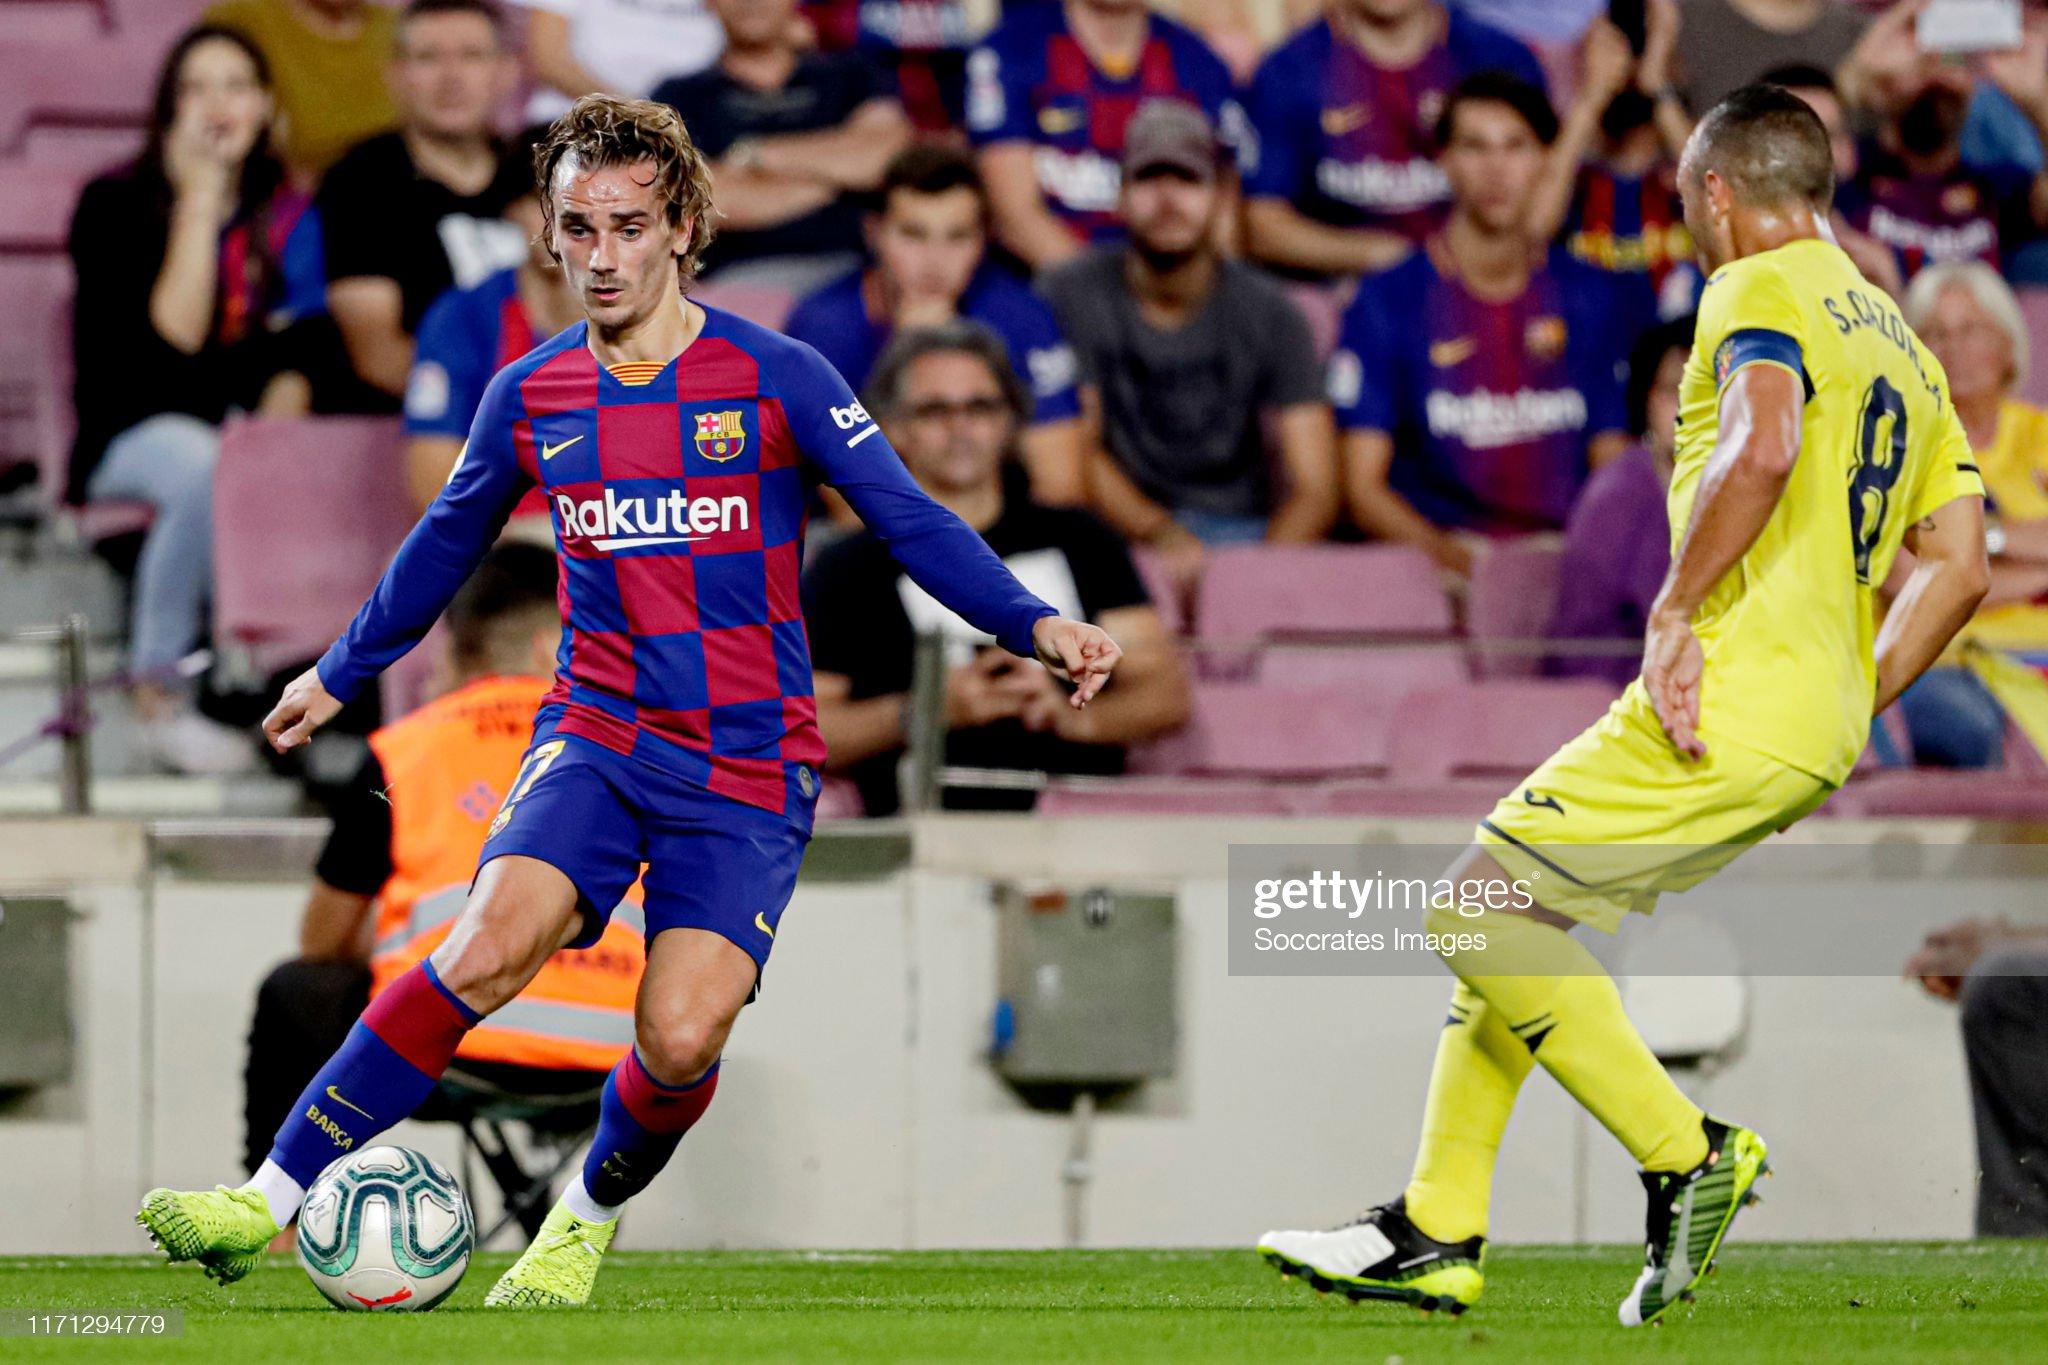 صور مباراة : برشلونة - فياريال 2-1 ( 24-09-2019 )  Antoine-griezmann-of-fc-barcelona-santi-cazorla-of-villarreal-during-picture-id1171294779?s=2048x2048